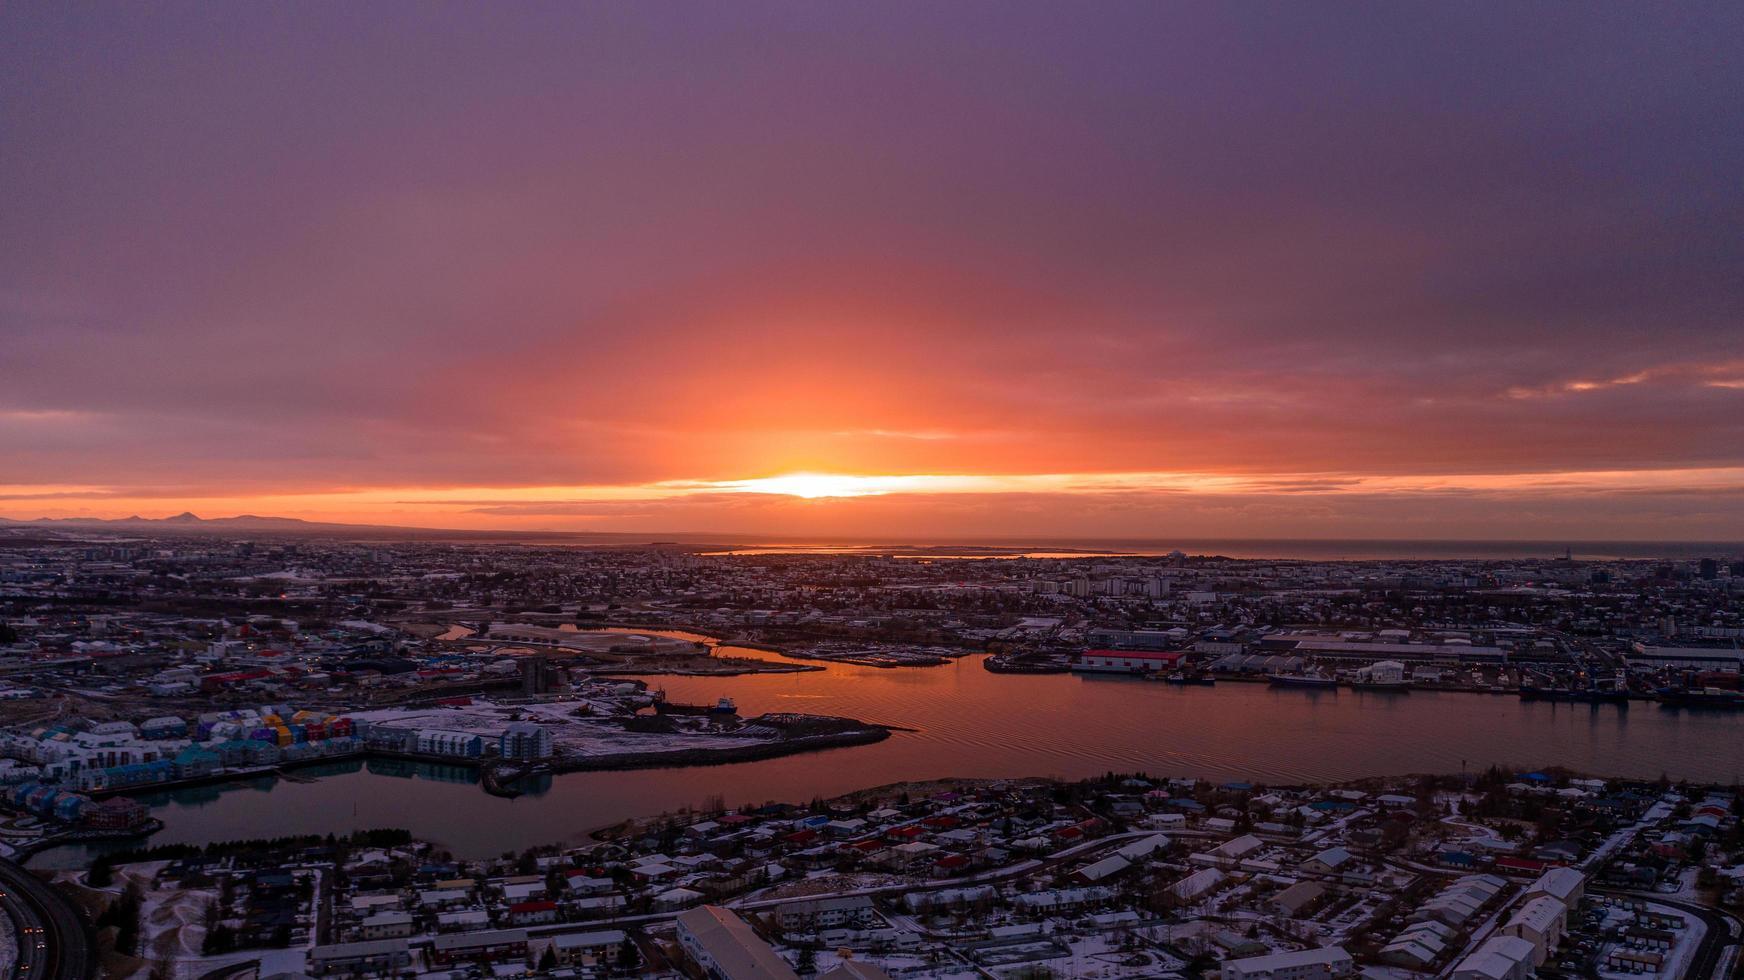 Bird's eye view photo of city during sunset